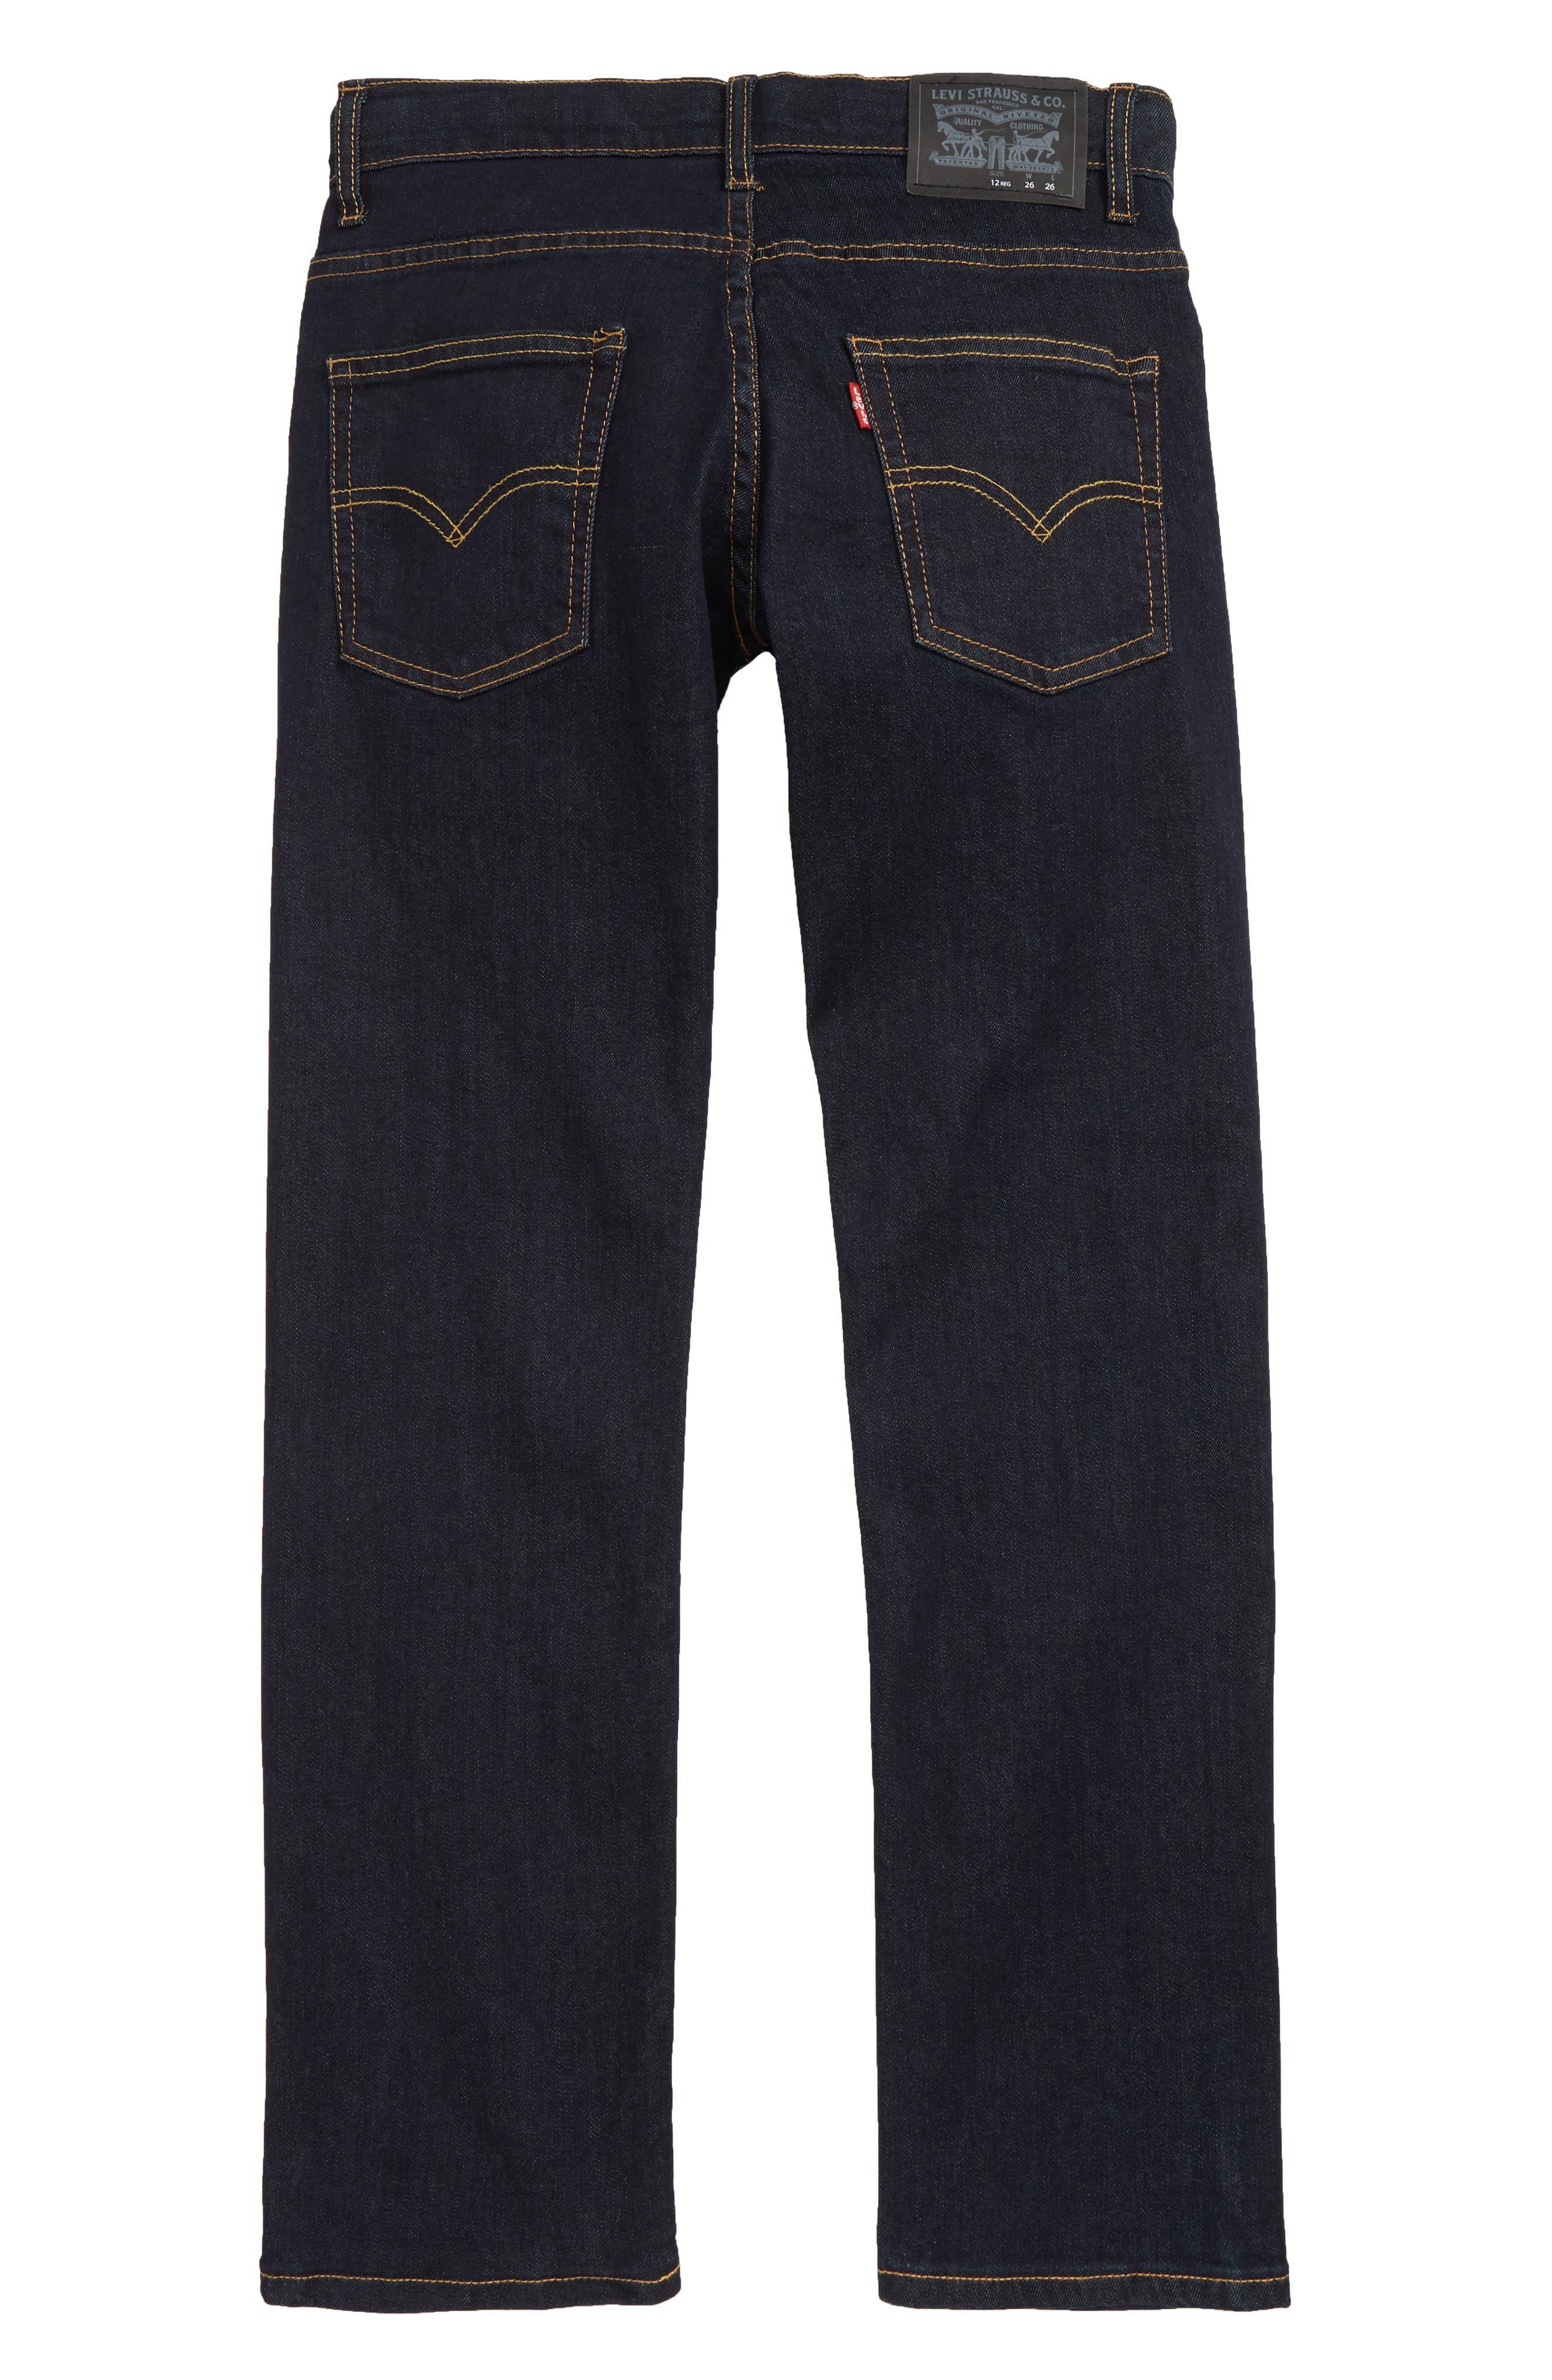 LEVI'S<SUP>®</SUP>,                             '511<sup>™</sup>' Slim Fit Jeans,                             Alternate thumbnail 2, color,                             419